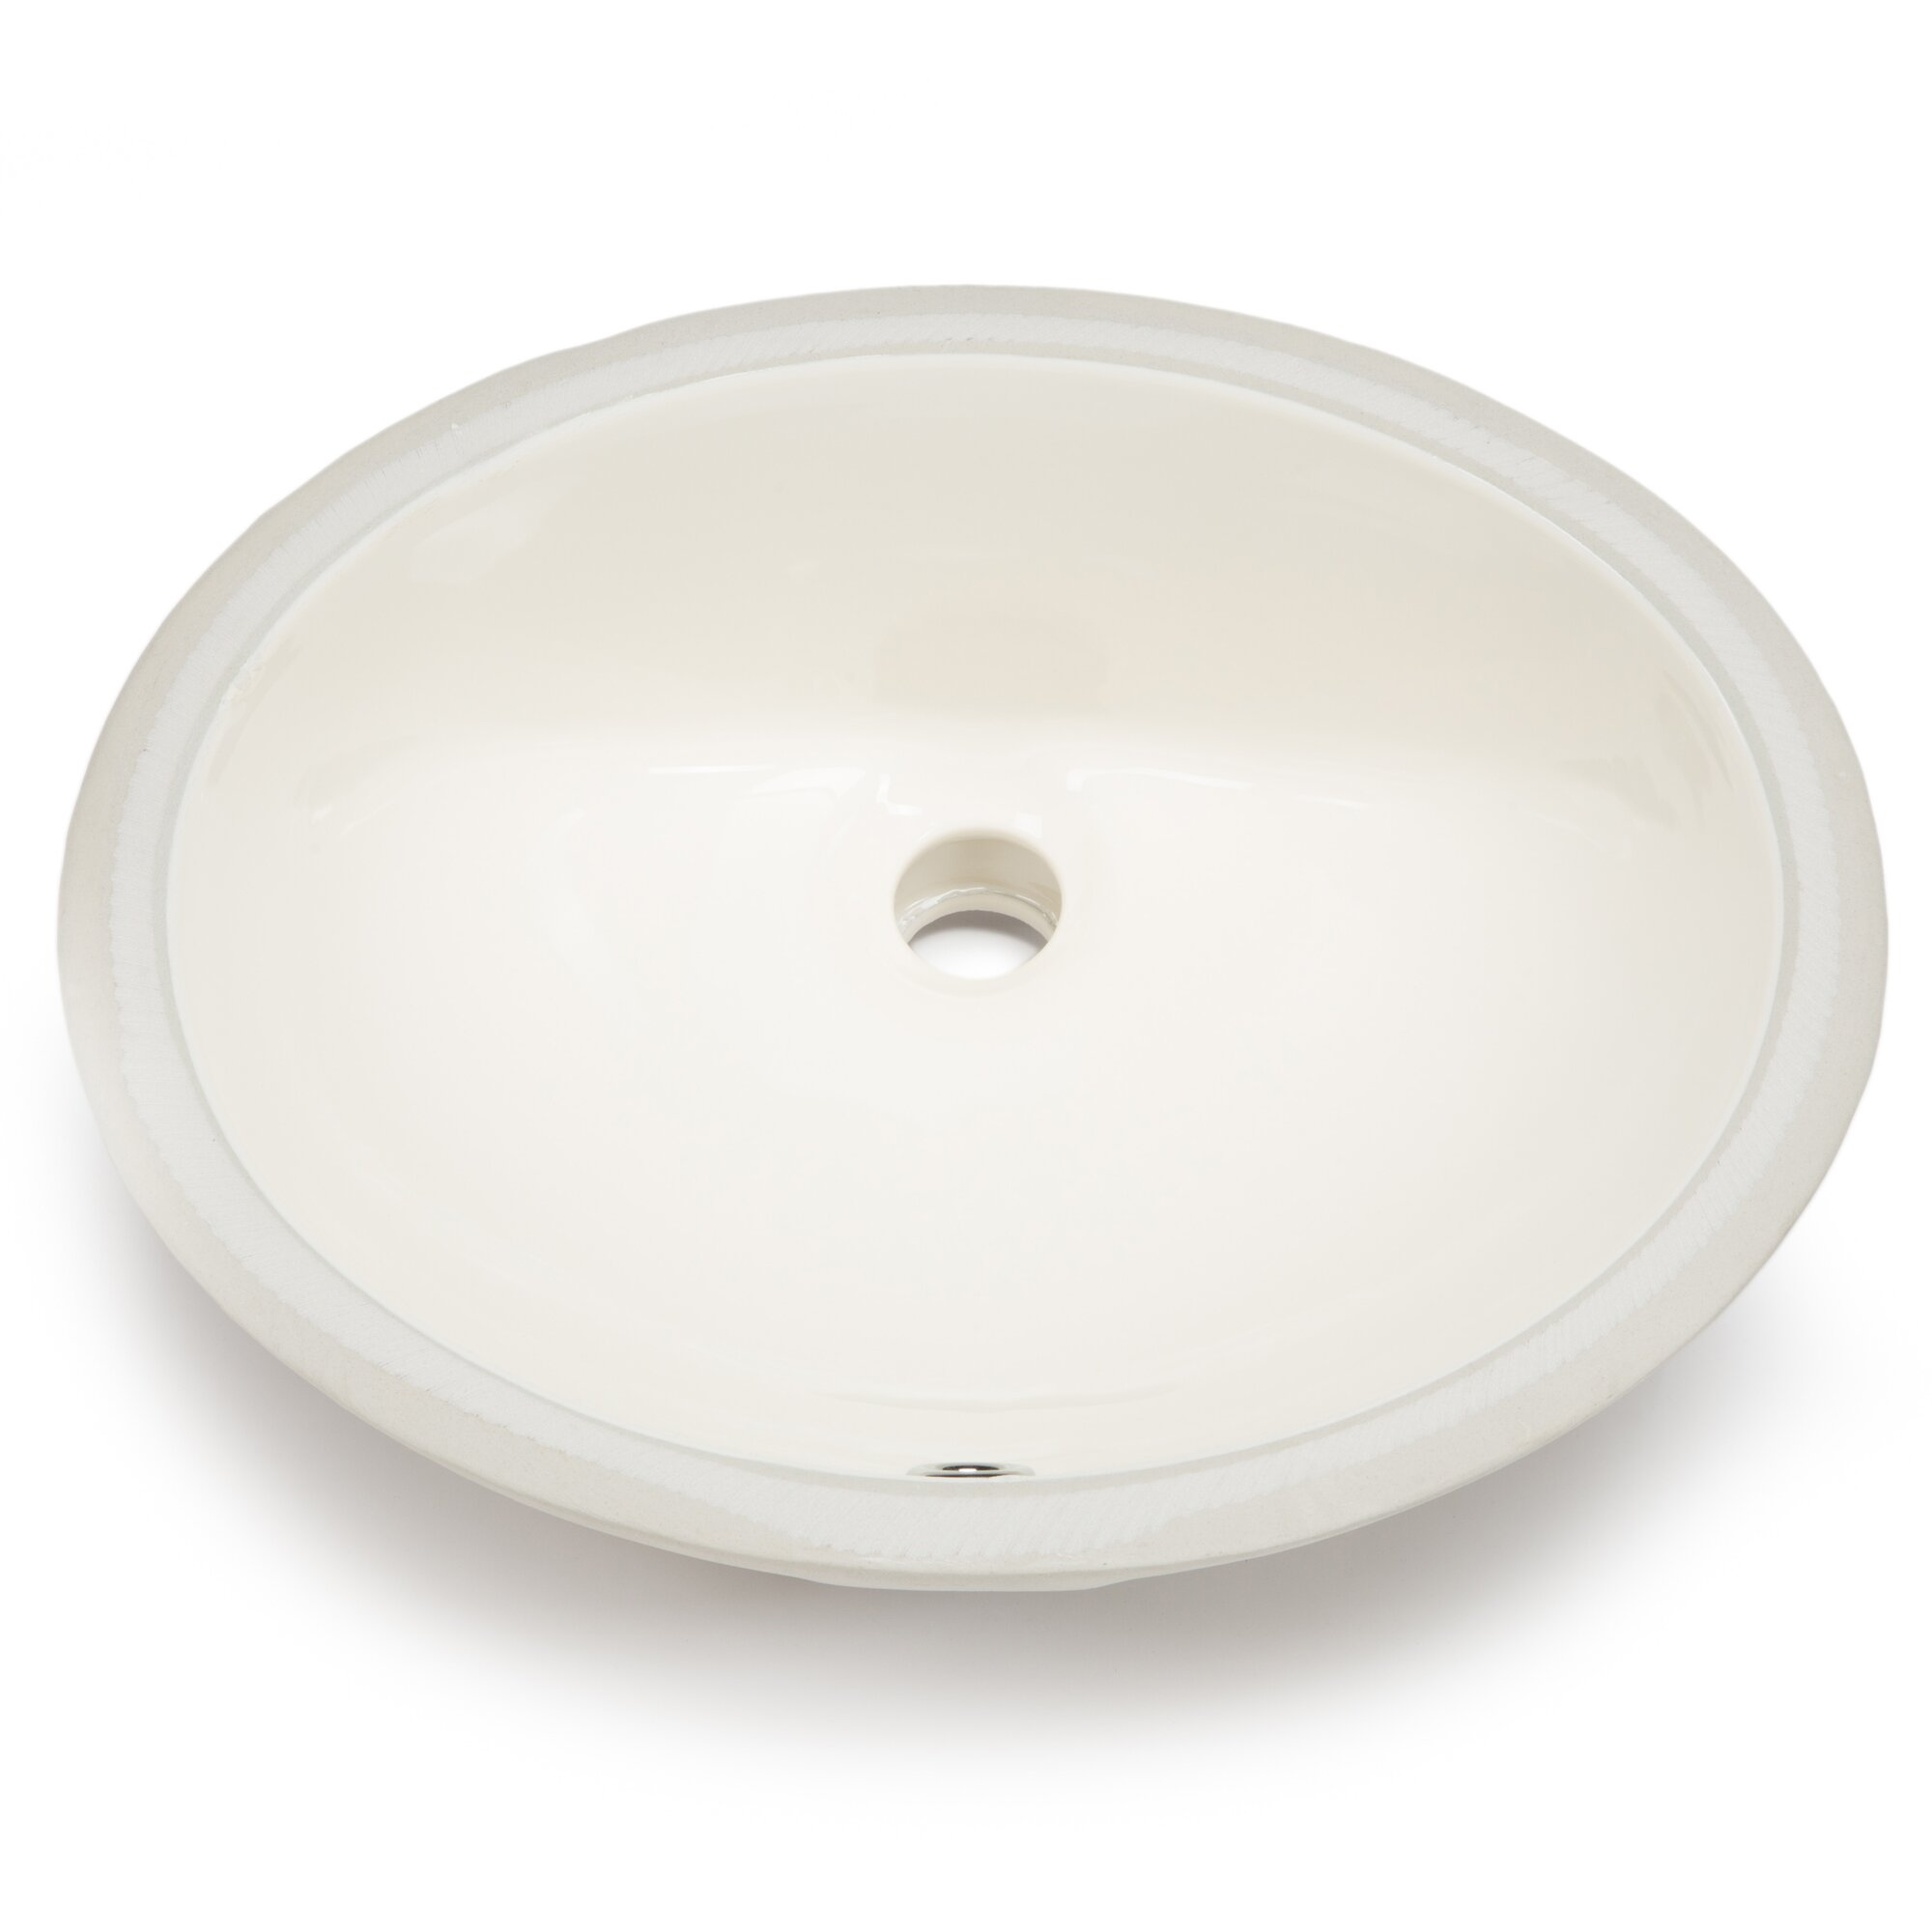 Hahn Ceramic Bowl Oval Undermount Bathroom Sink with